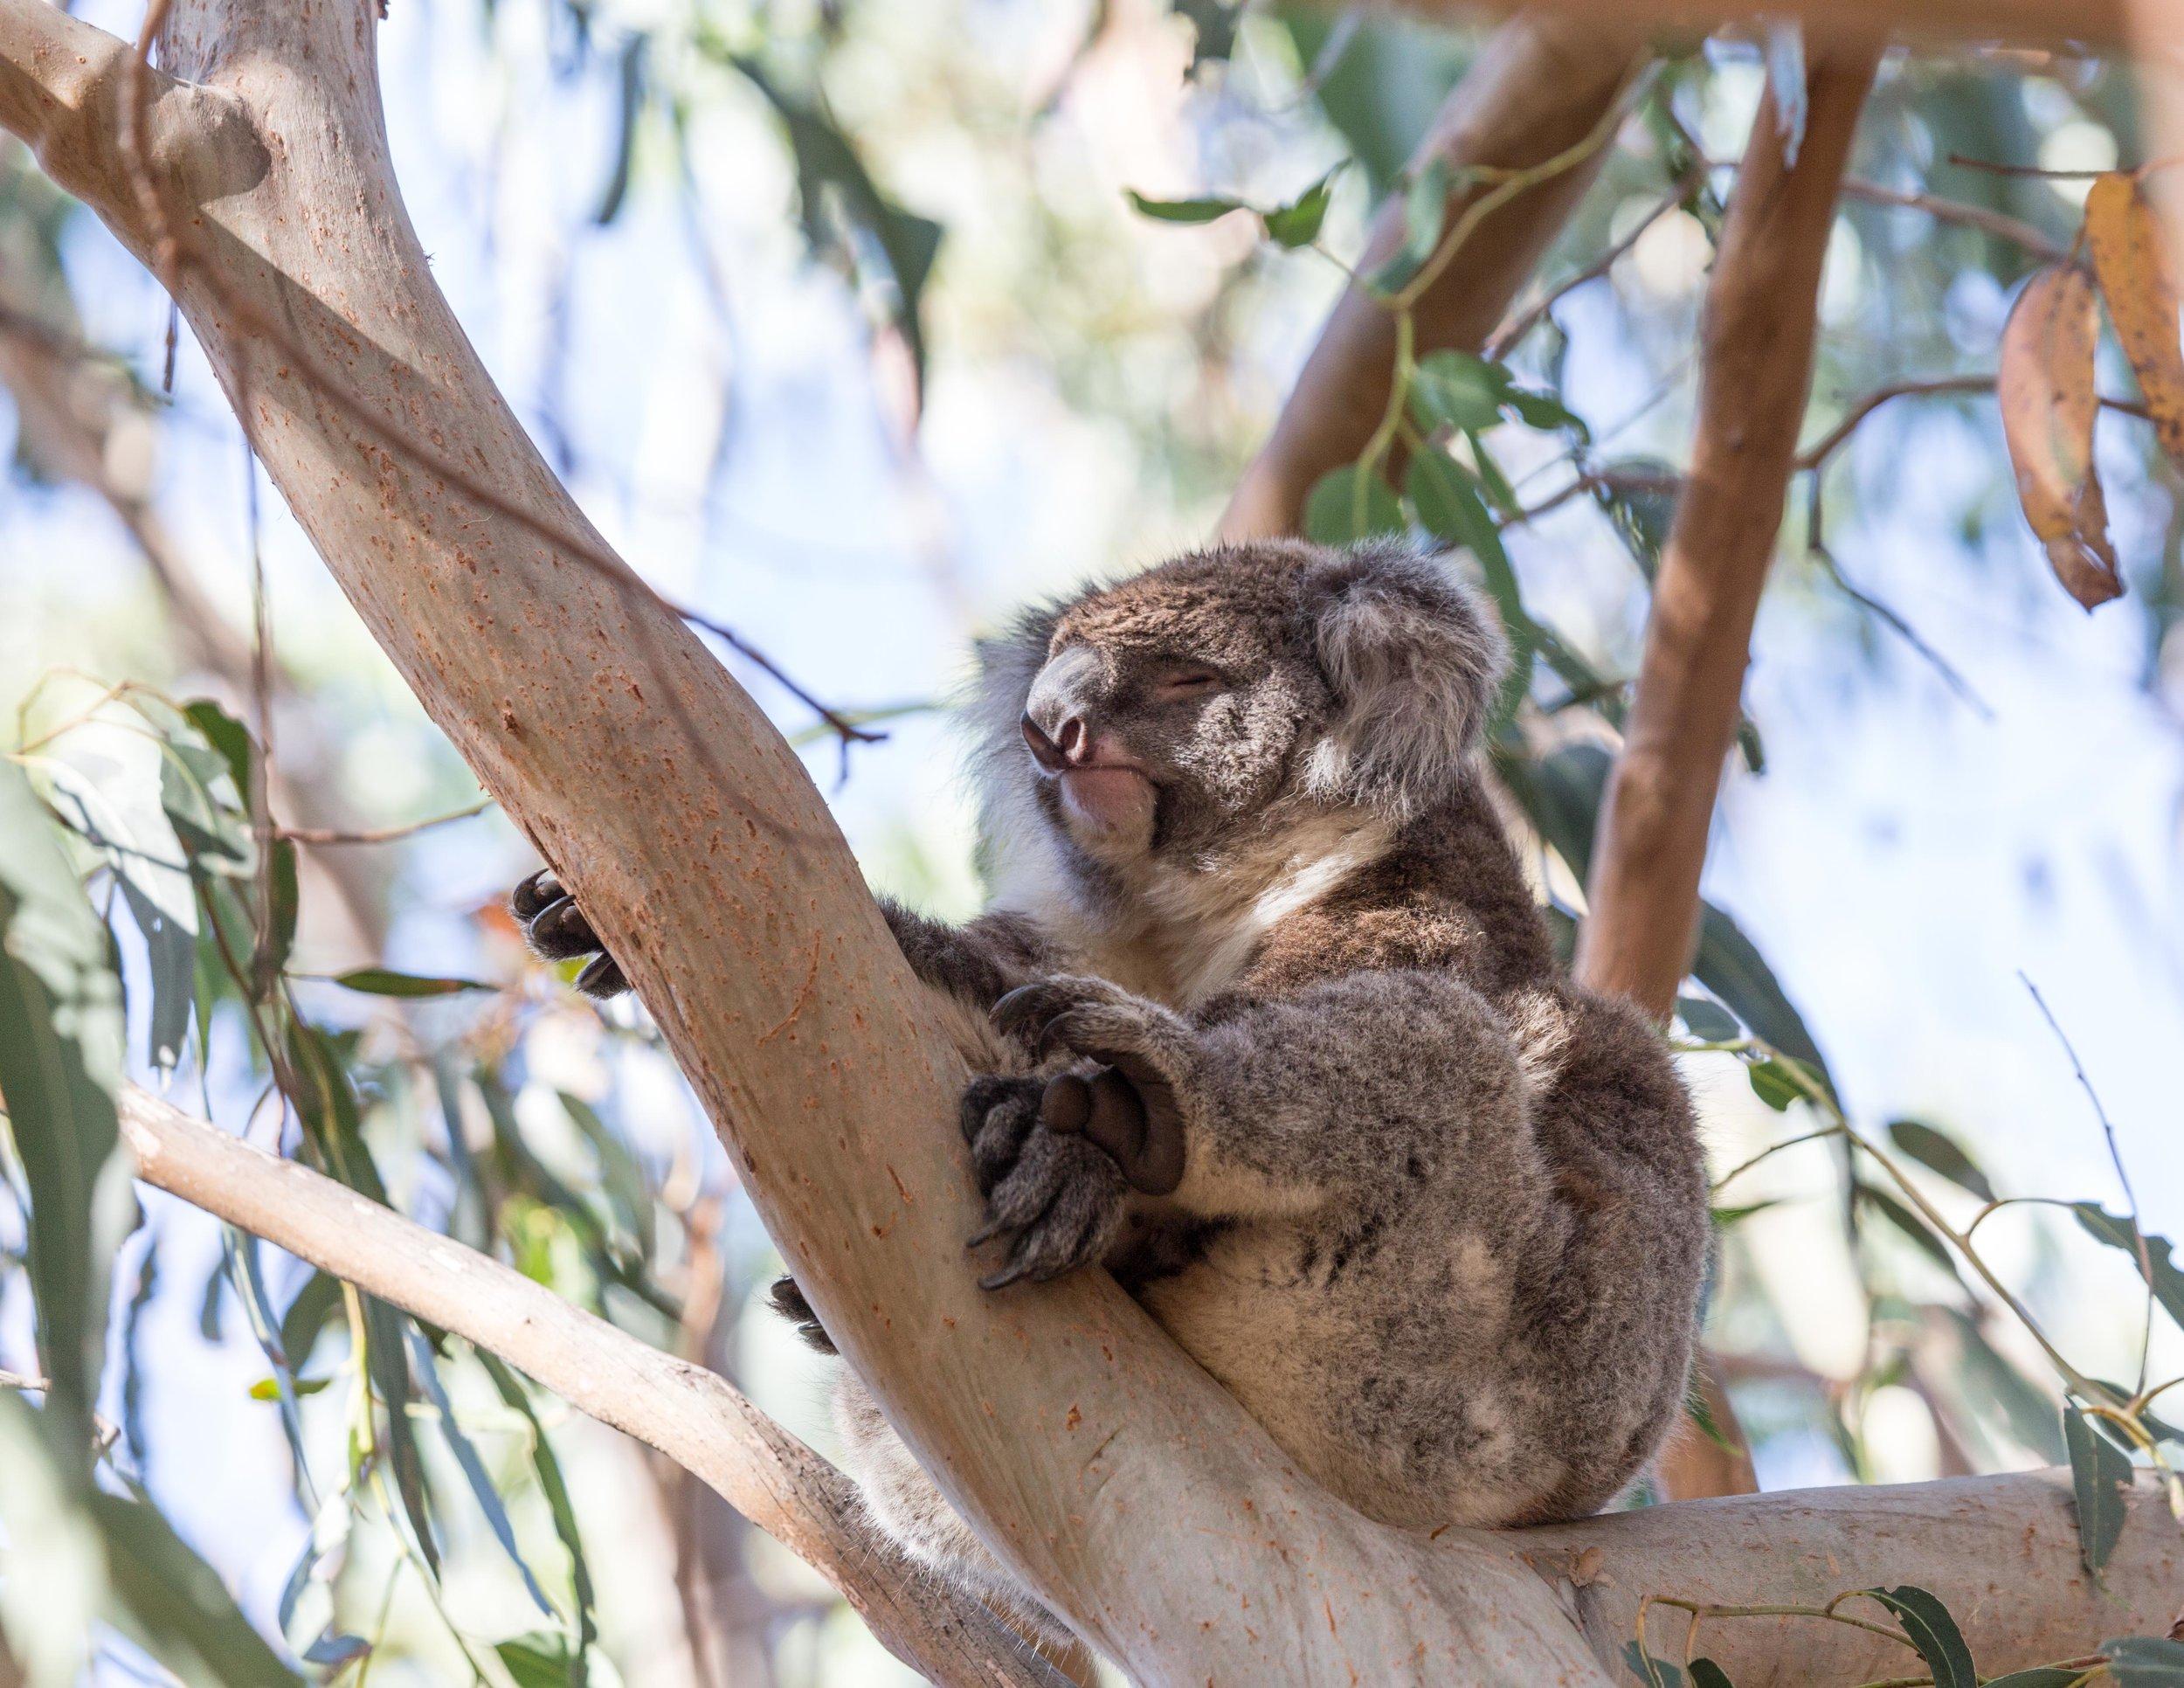 Koalas on the Great Ocean Road, Where to see wild koalas in Australia